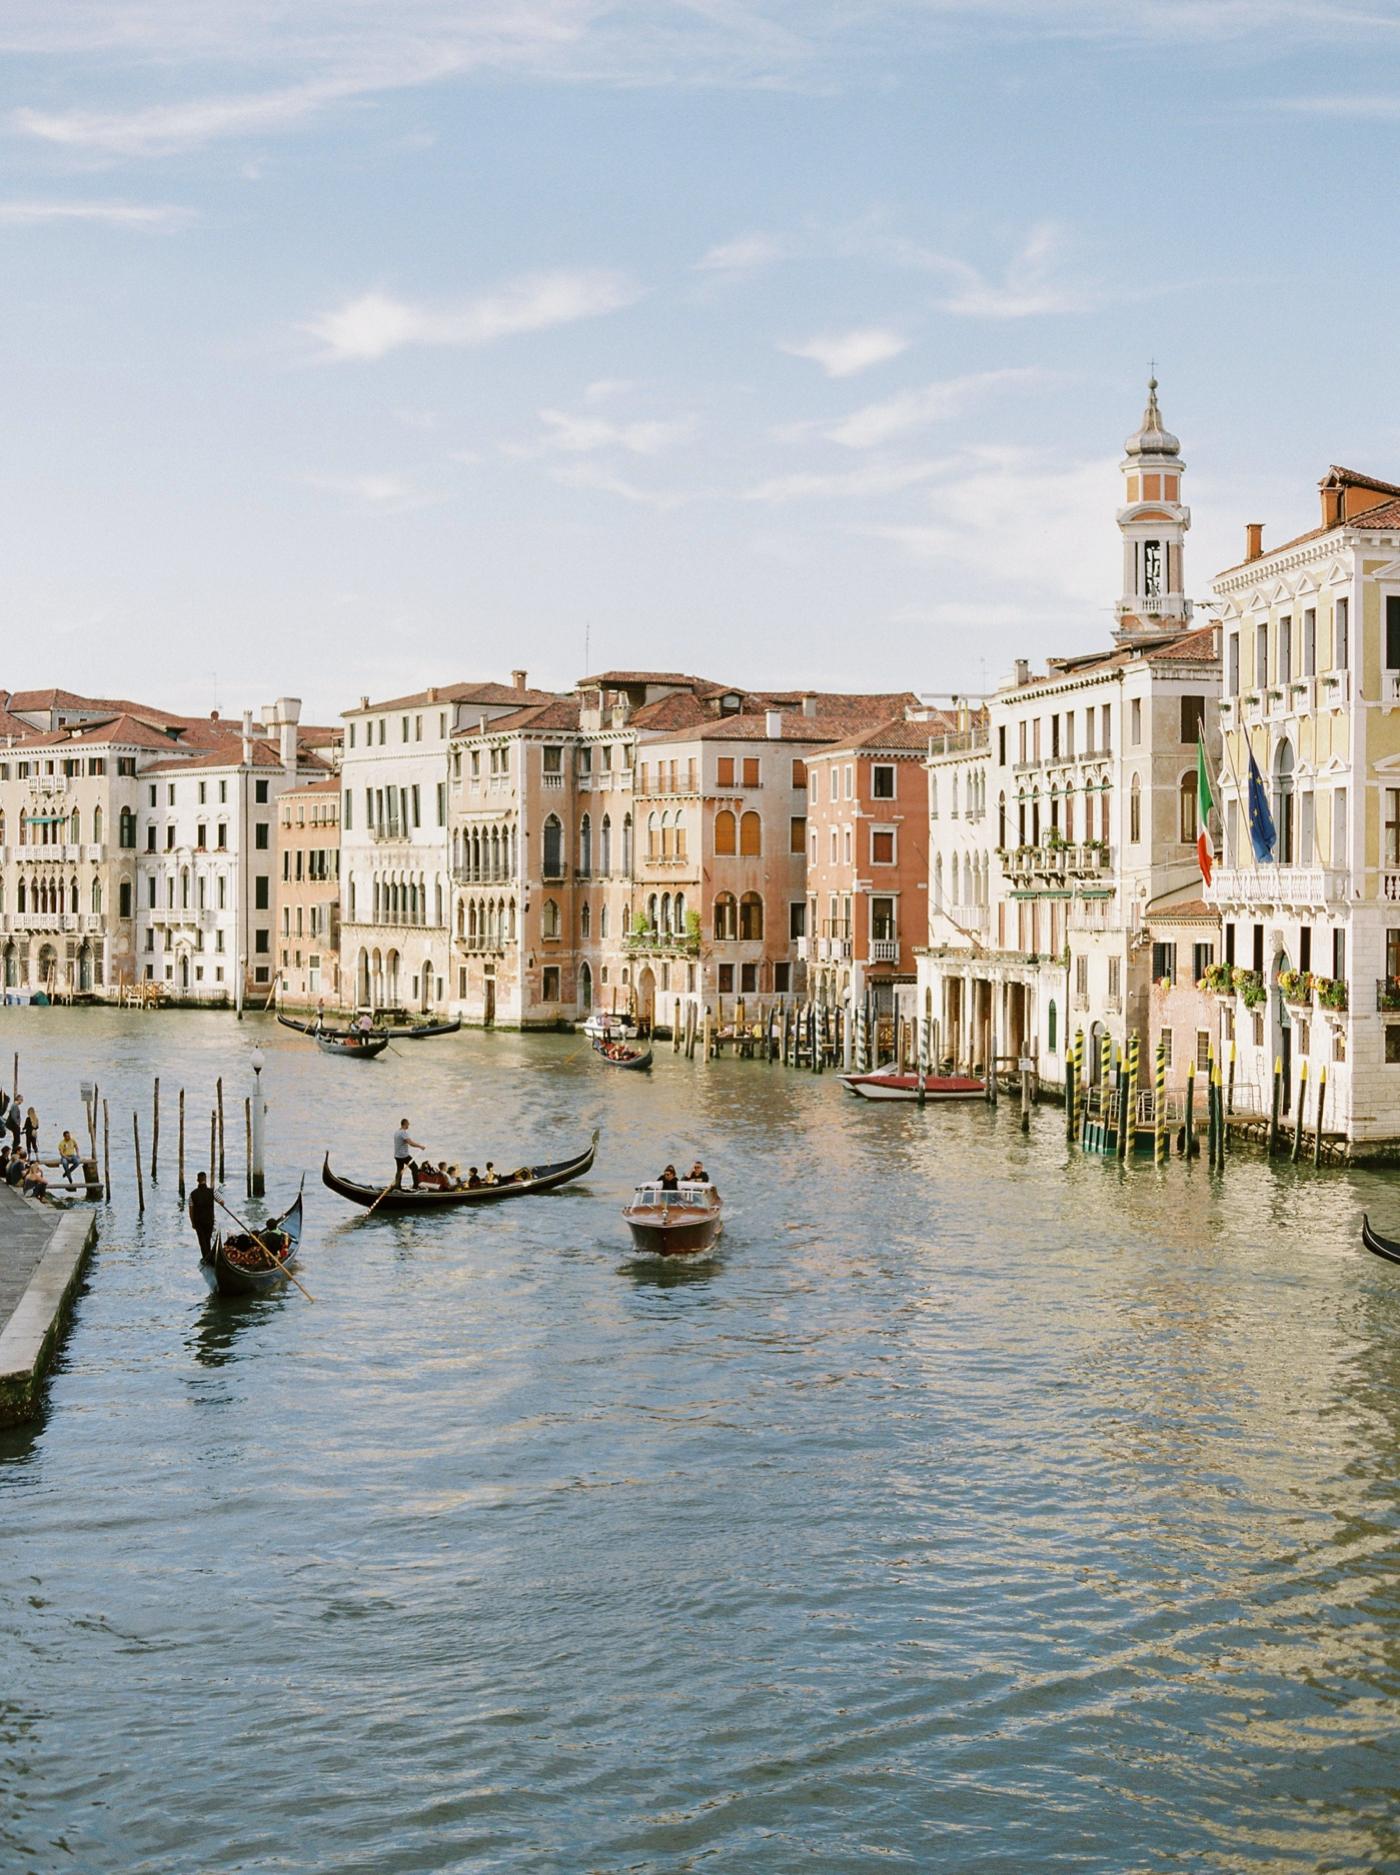 Venice italy wedding photographers   couples honeymoon session   exploring venice canals with film photographer justine milton   travel art prints